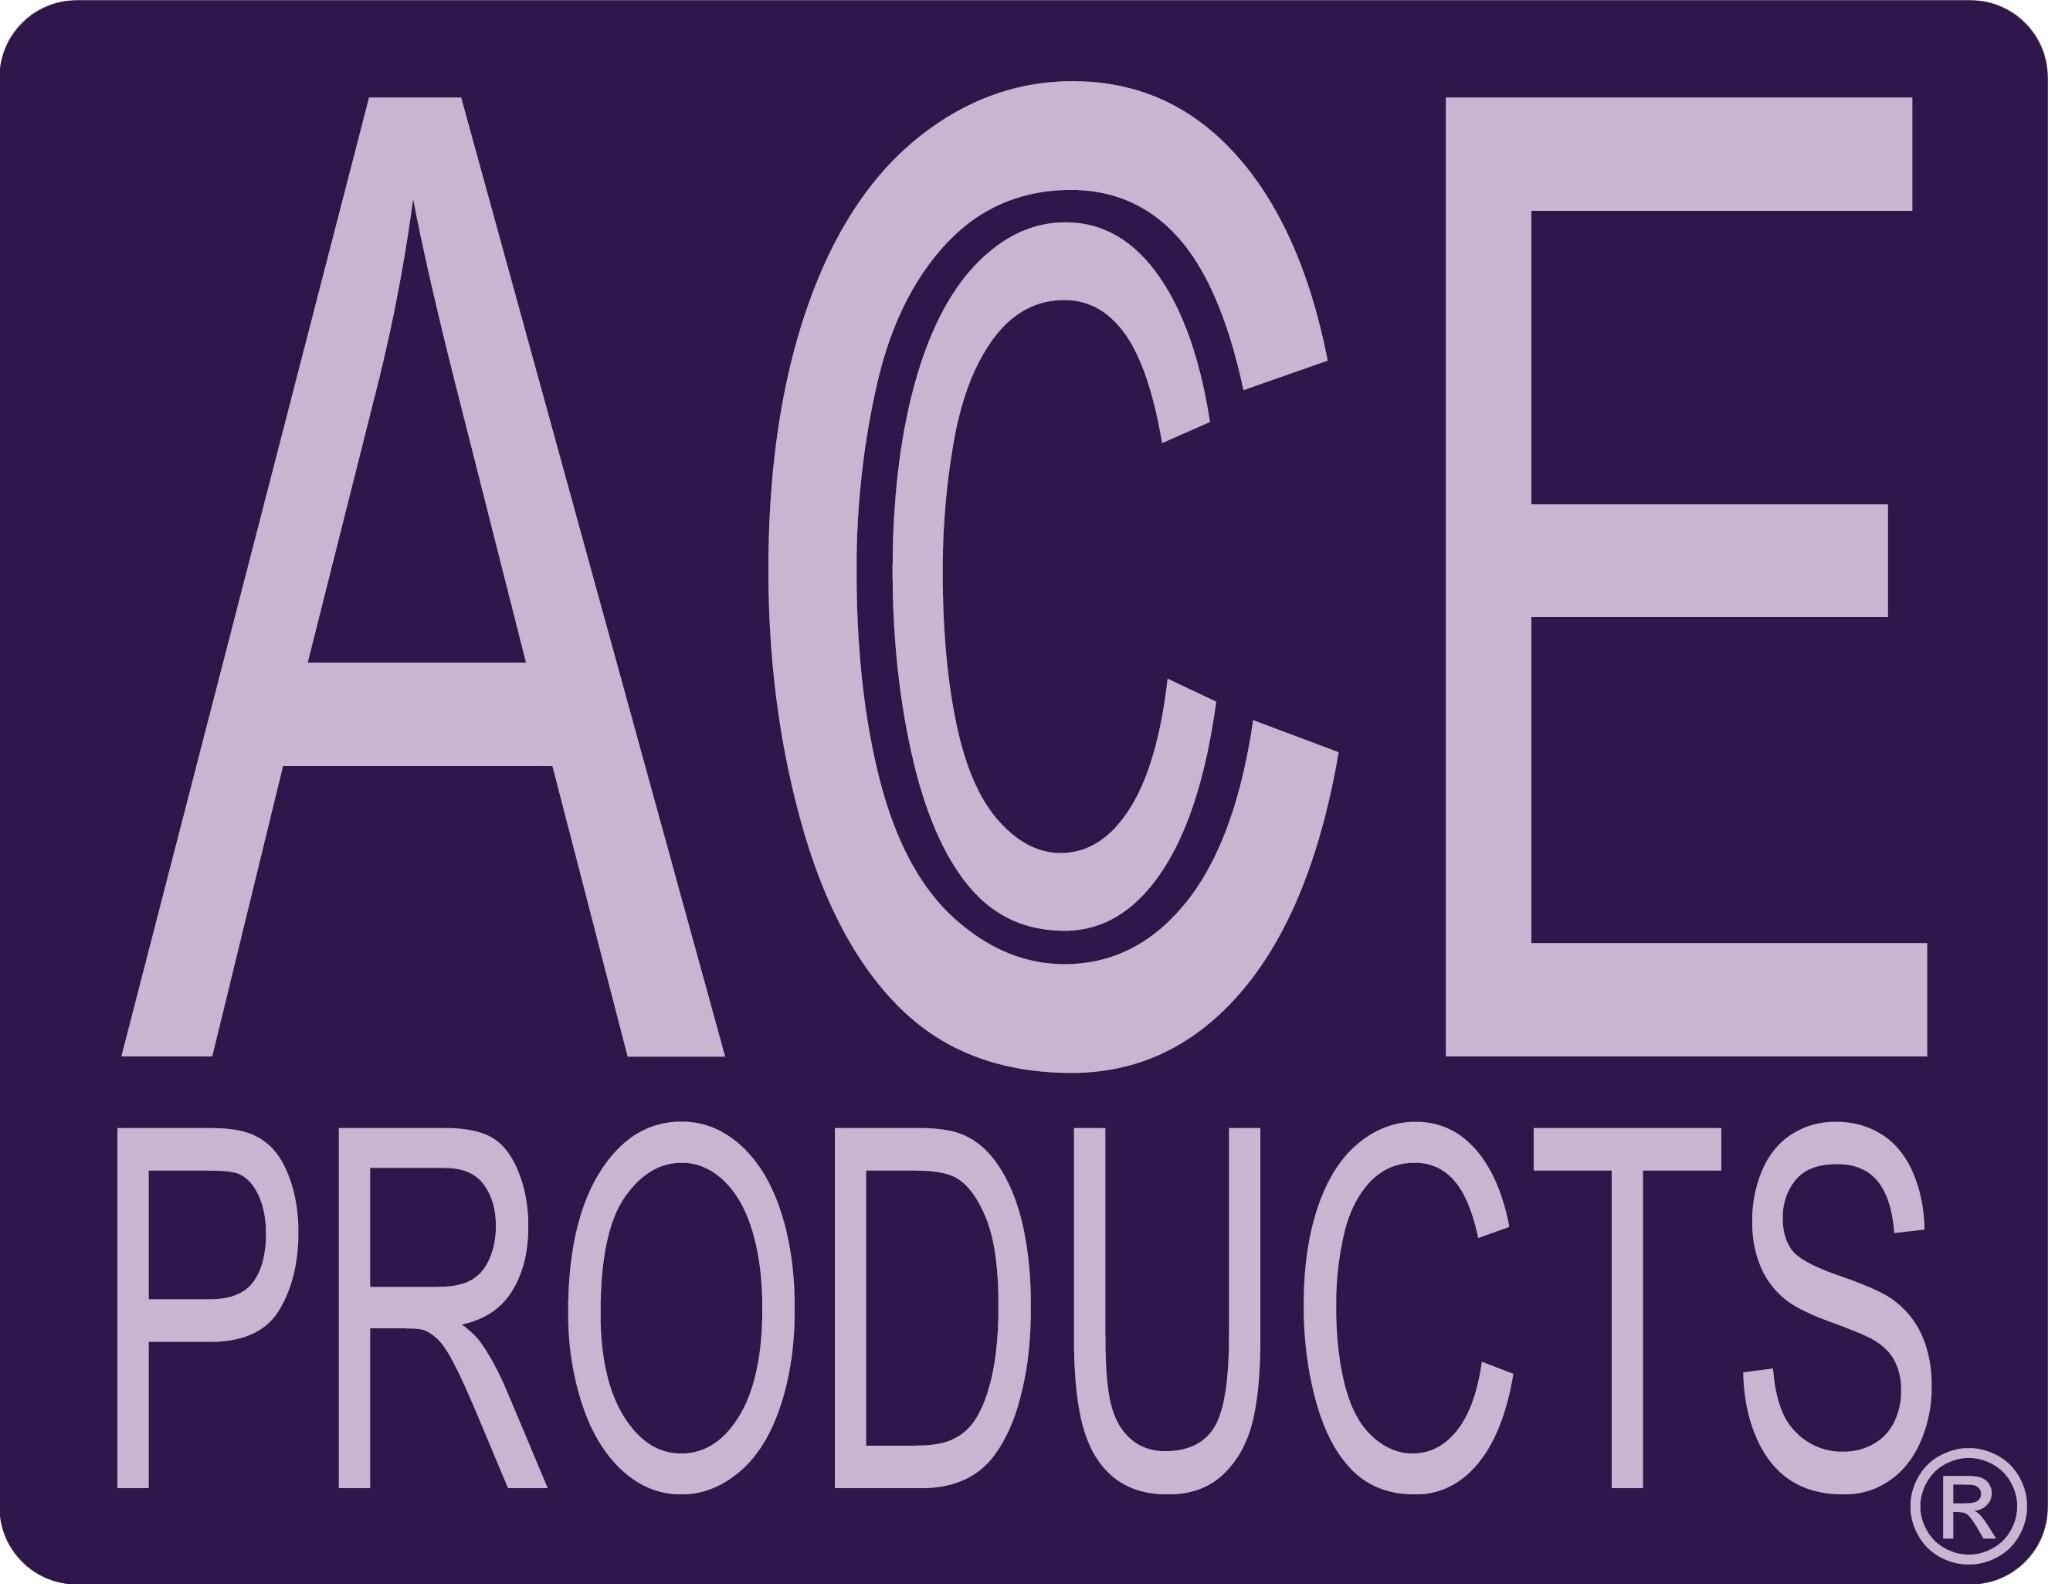 Acce Products Vouchers